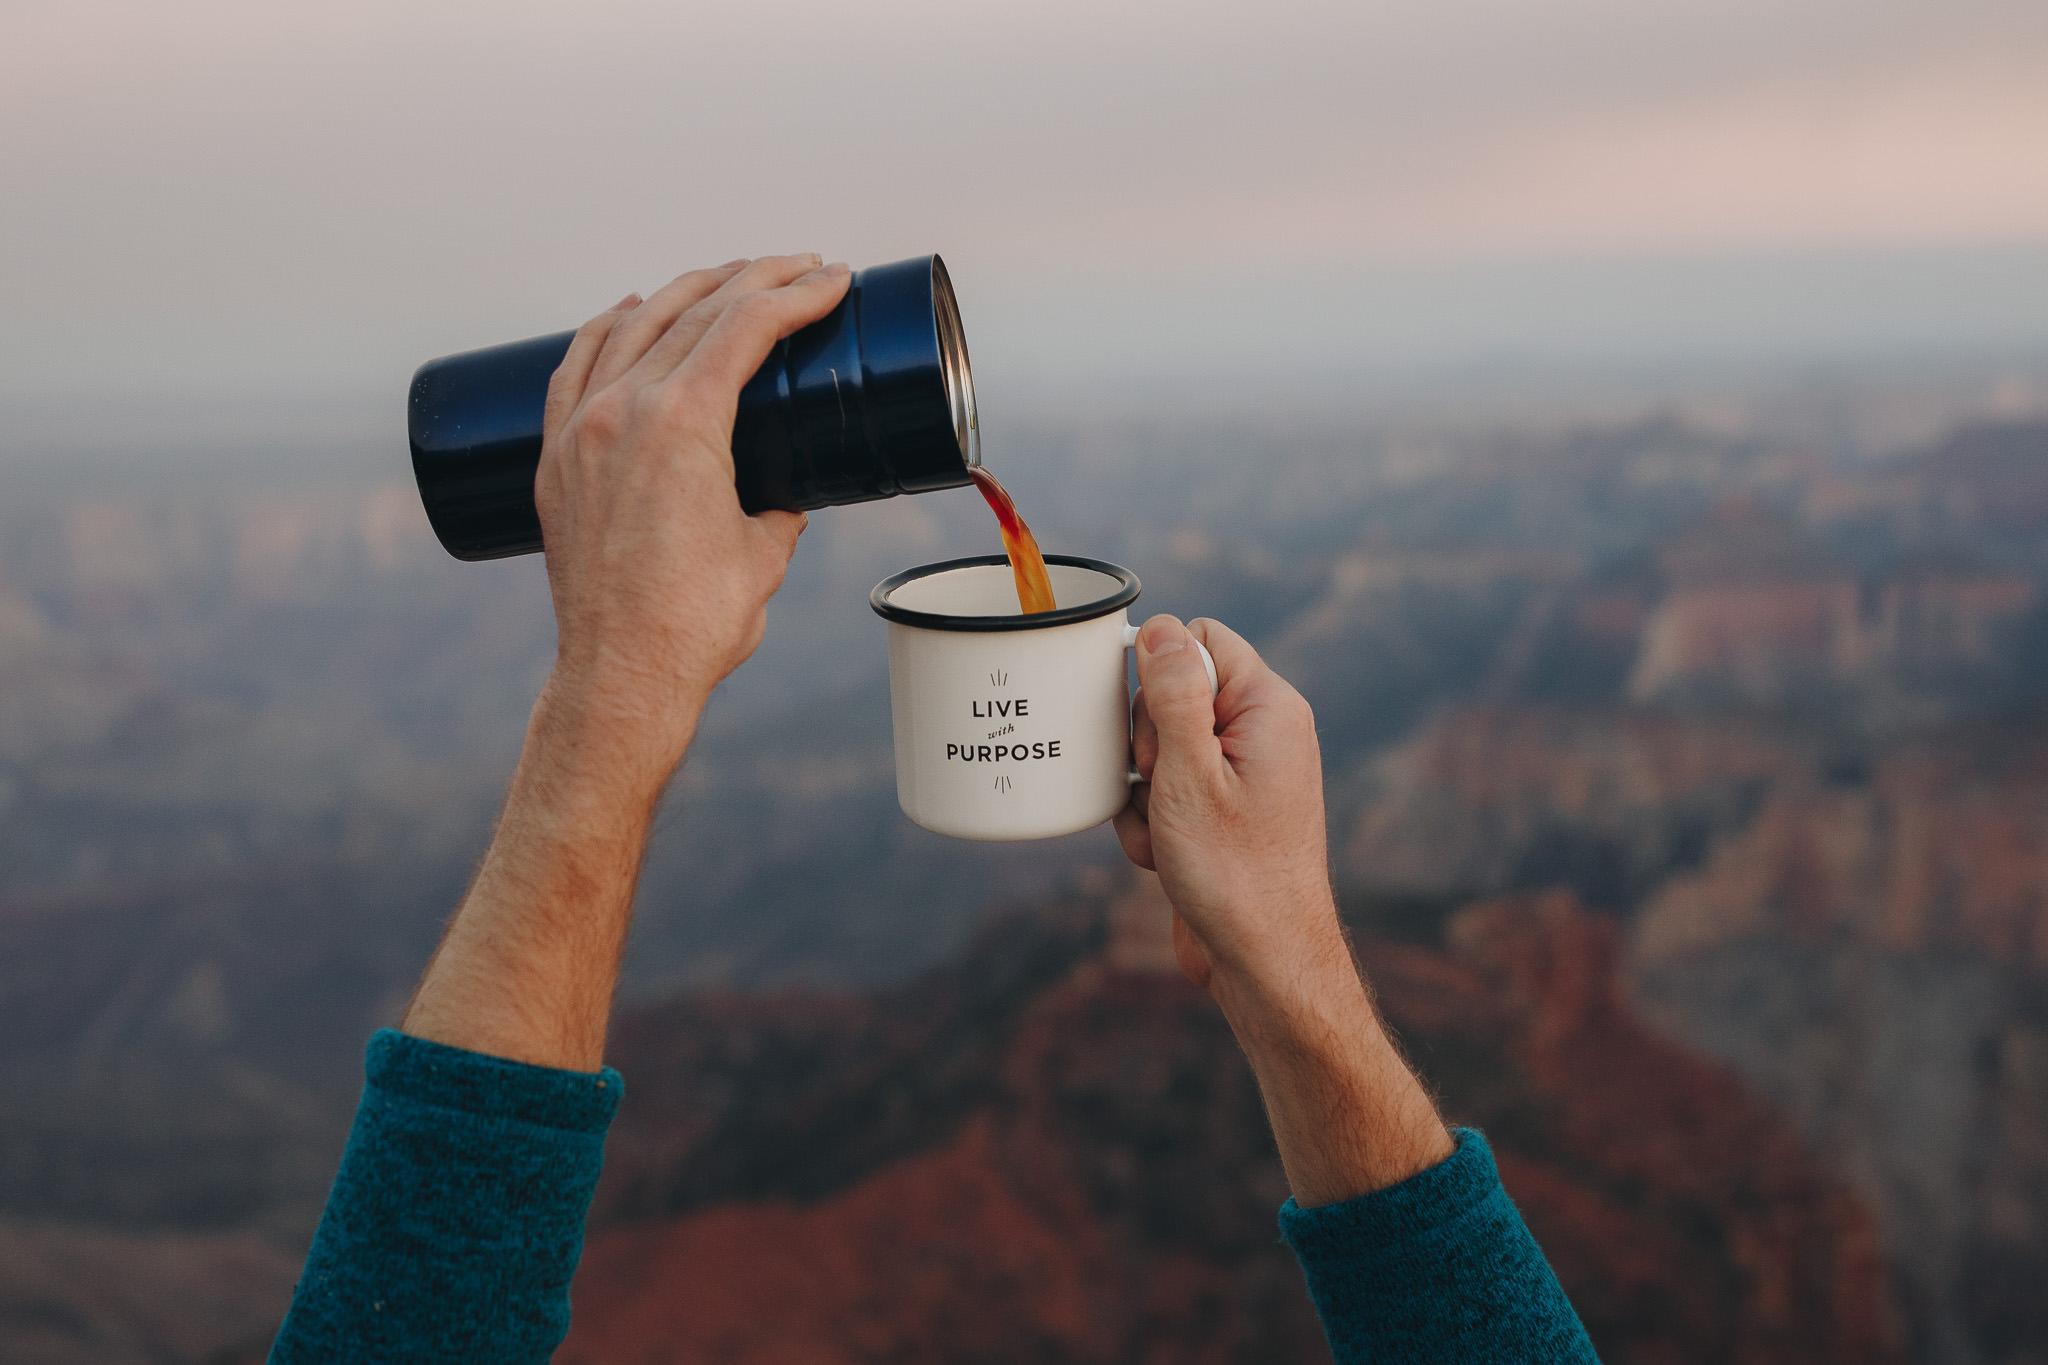 Pouring Aeropress coffee into Created Co mug